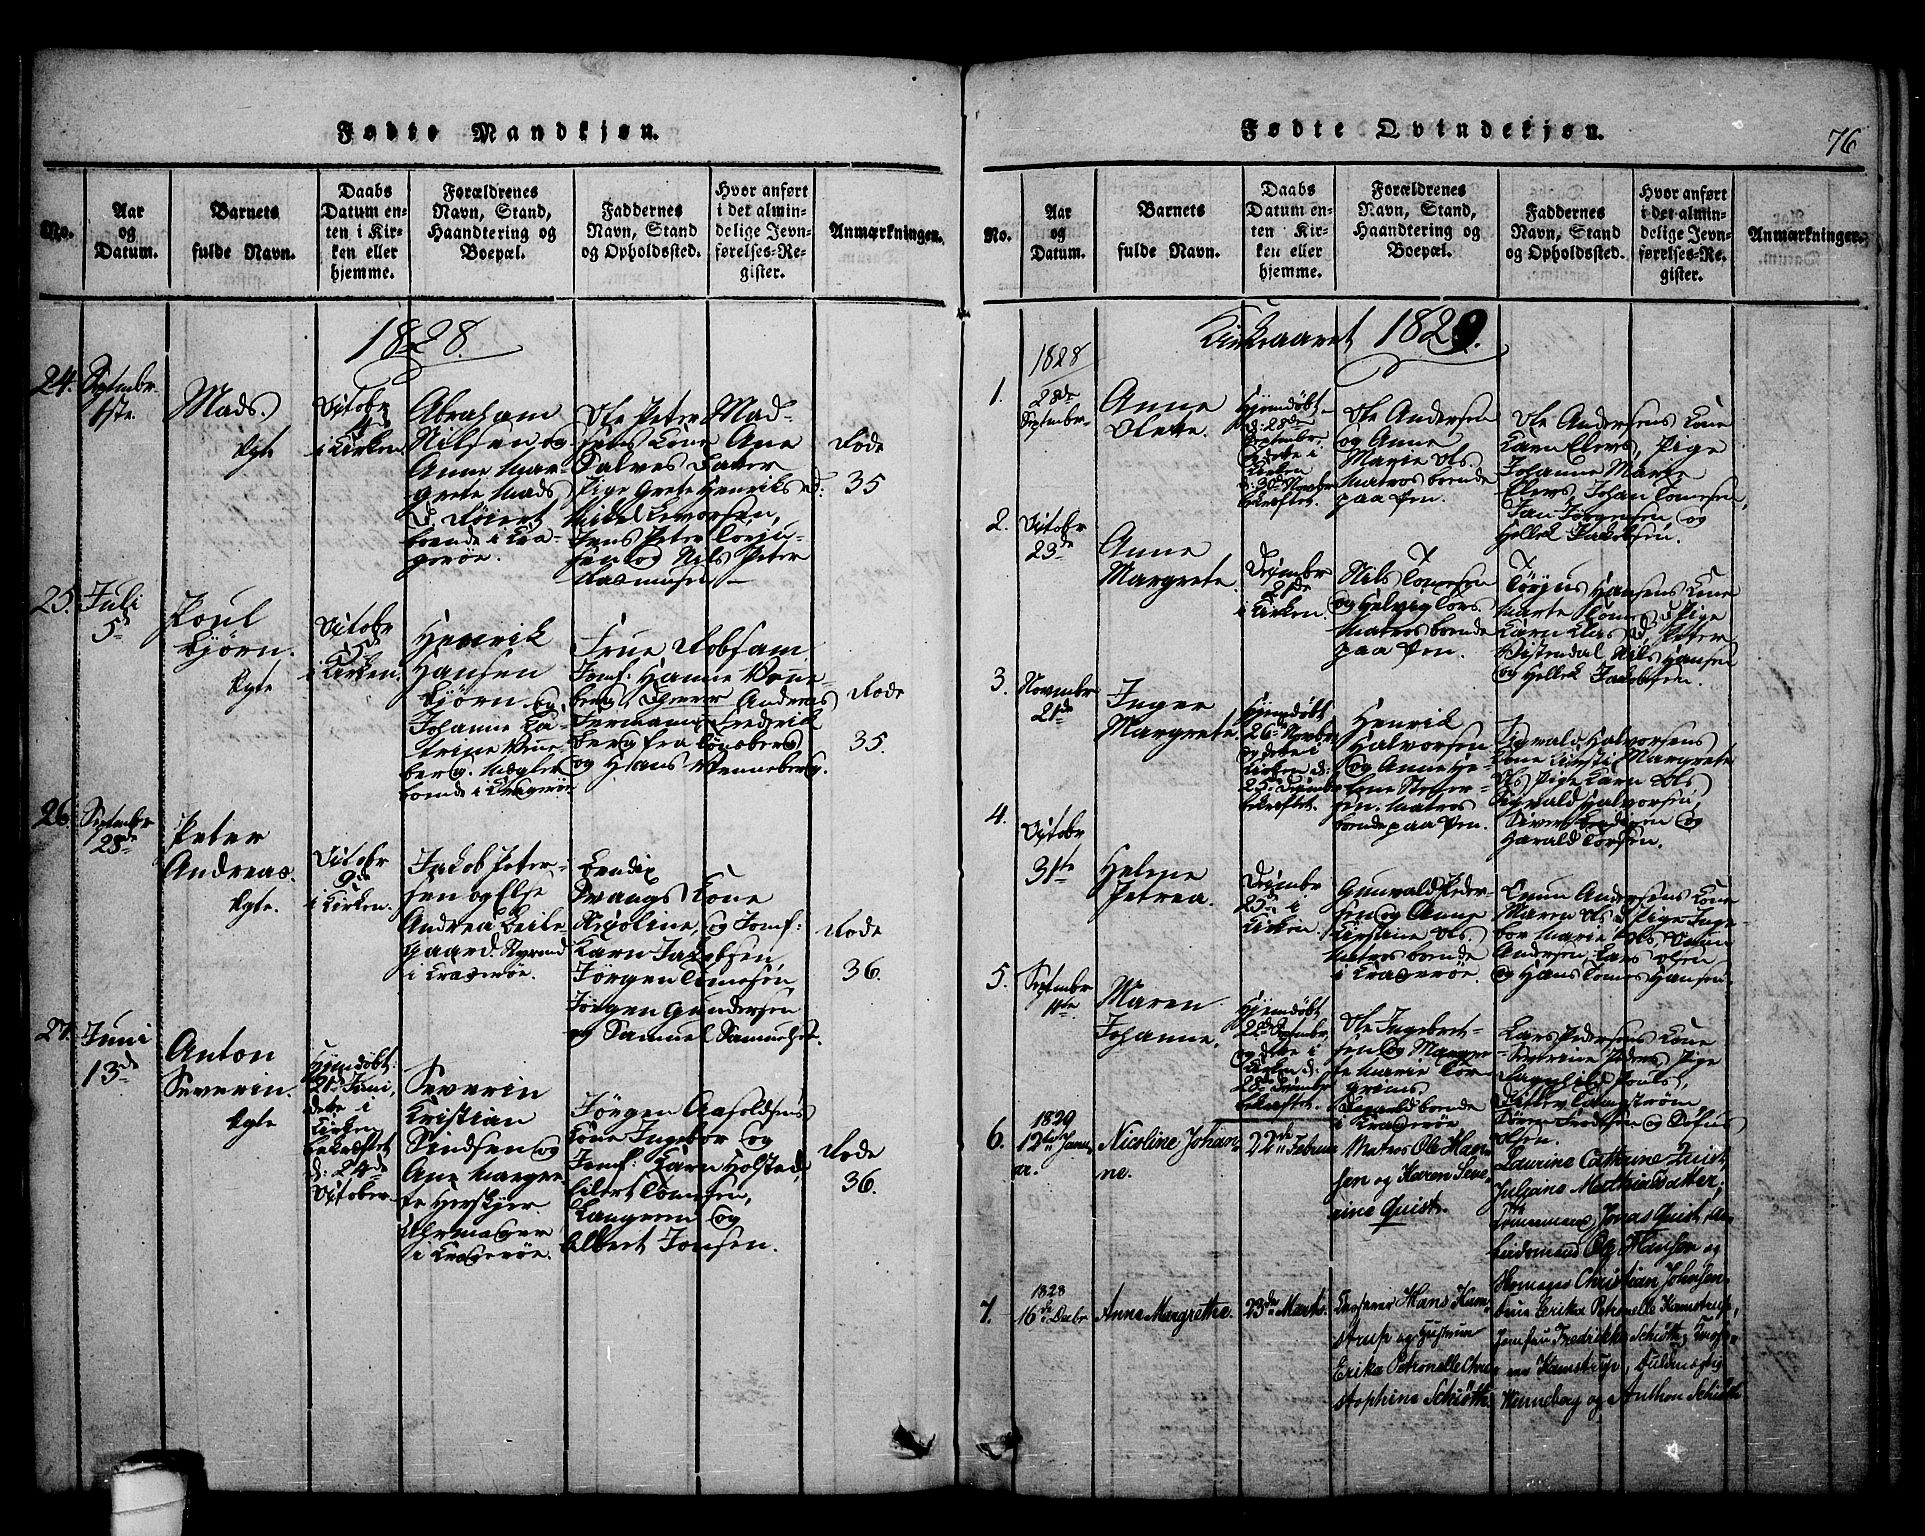 SAKO, Kragerø kirkebøker, F/Fa/L0004: Ministerialbok nr. 4, 1814-1831, s. 76